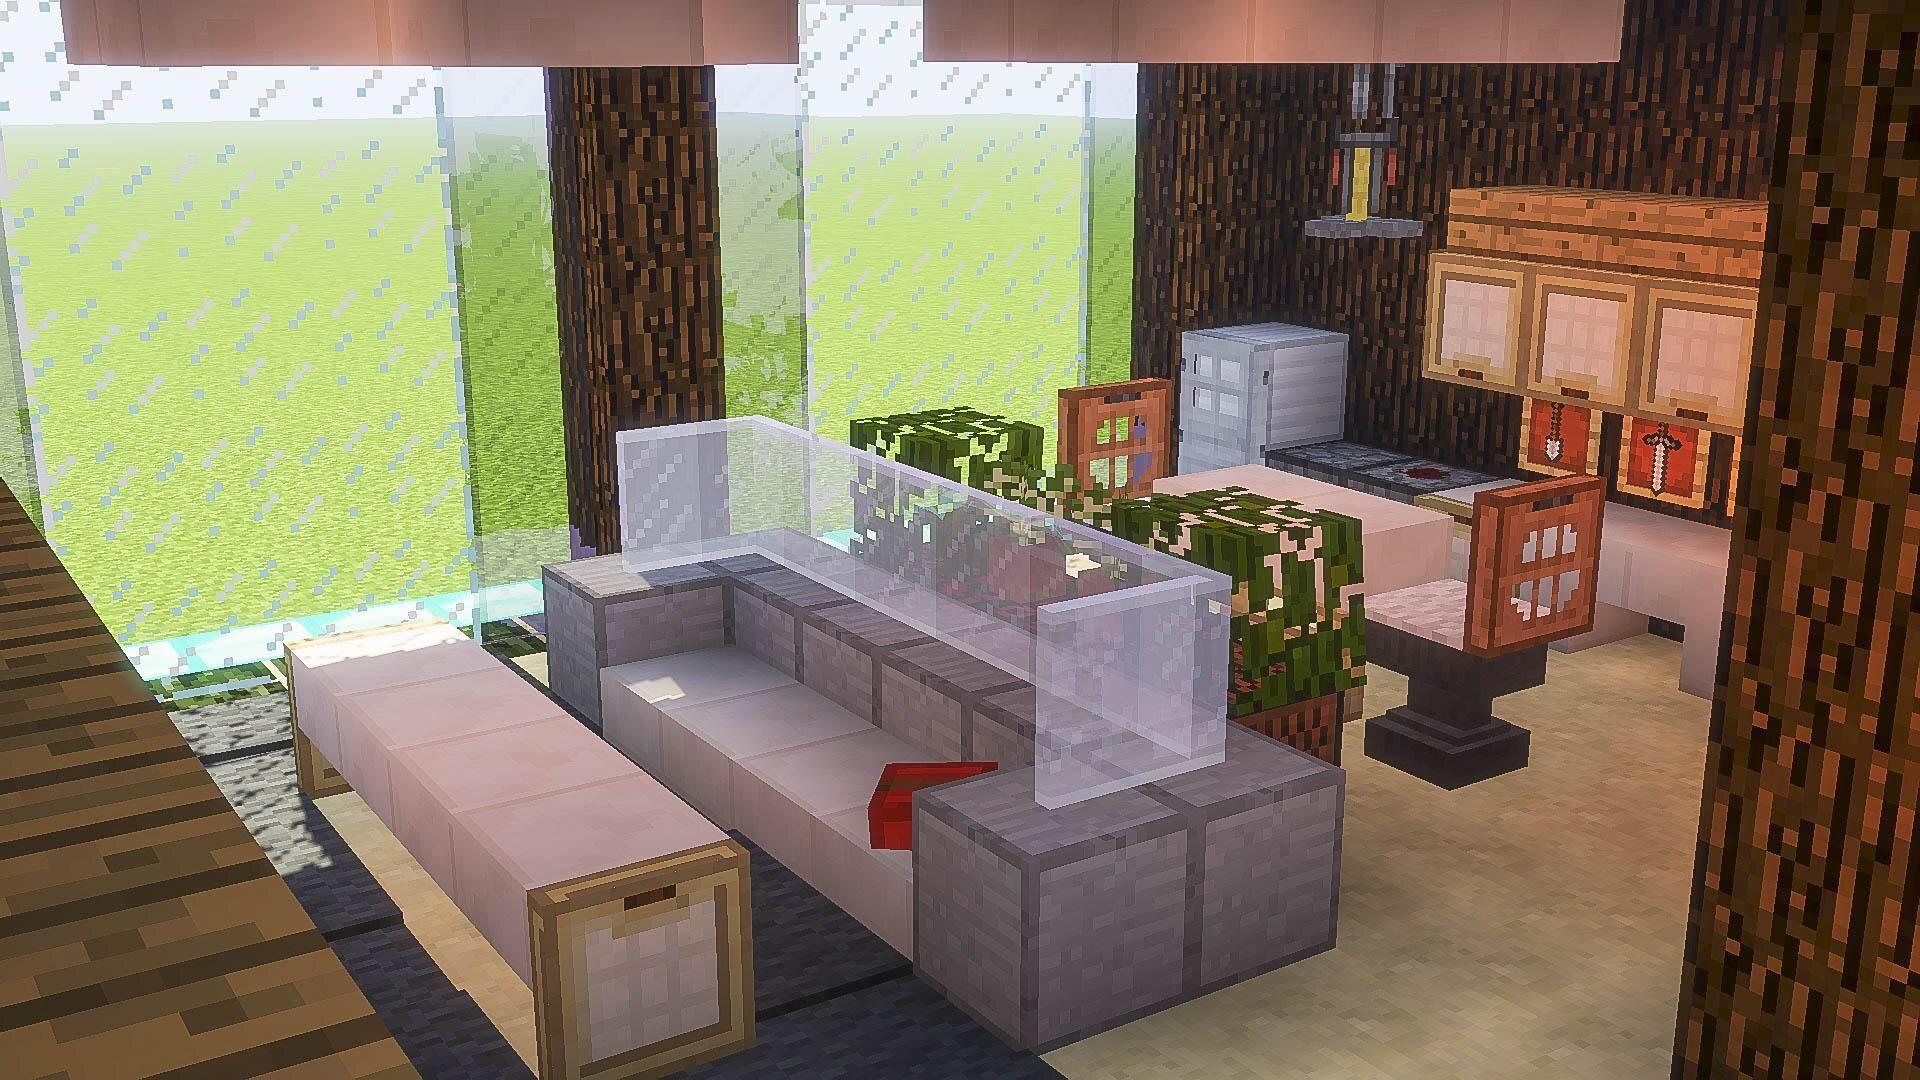 Utensil, coffee table | Minecraft room, Minecraft interior ...